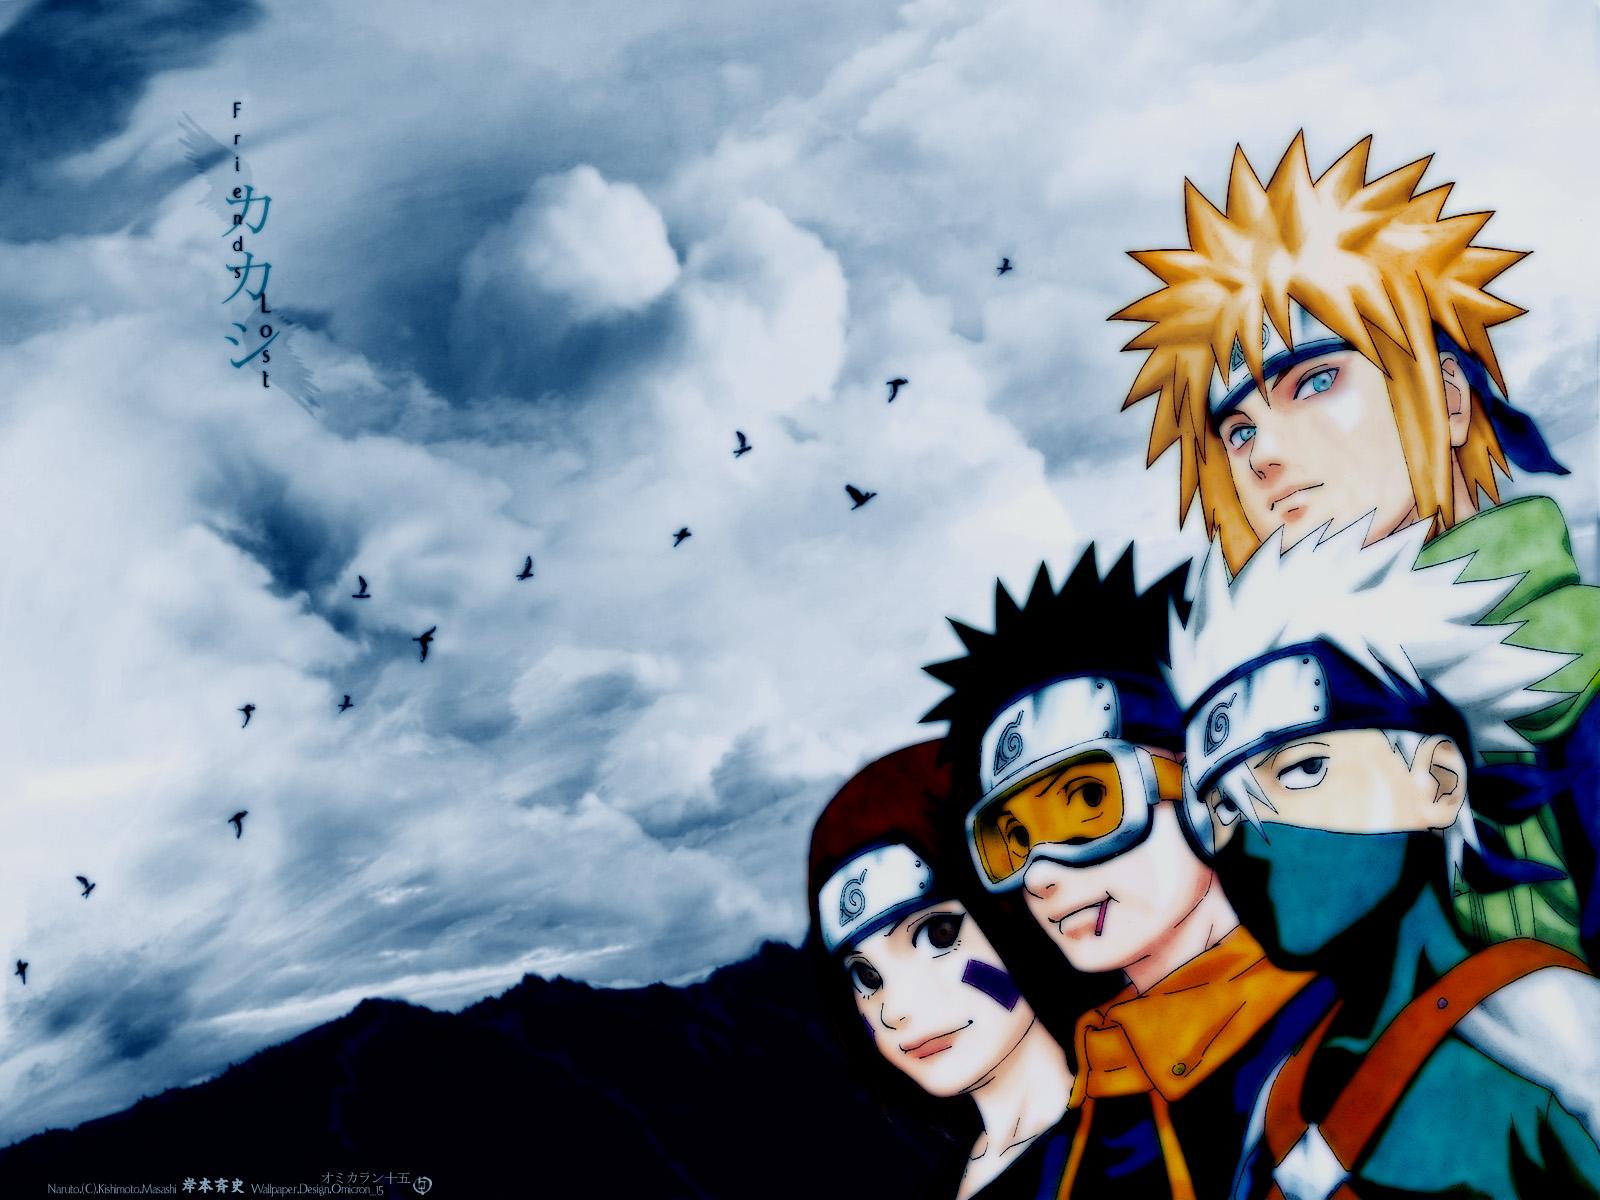 Download 300+ Wallpaper Naruto Animasi Bergerak HD Terbaru